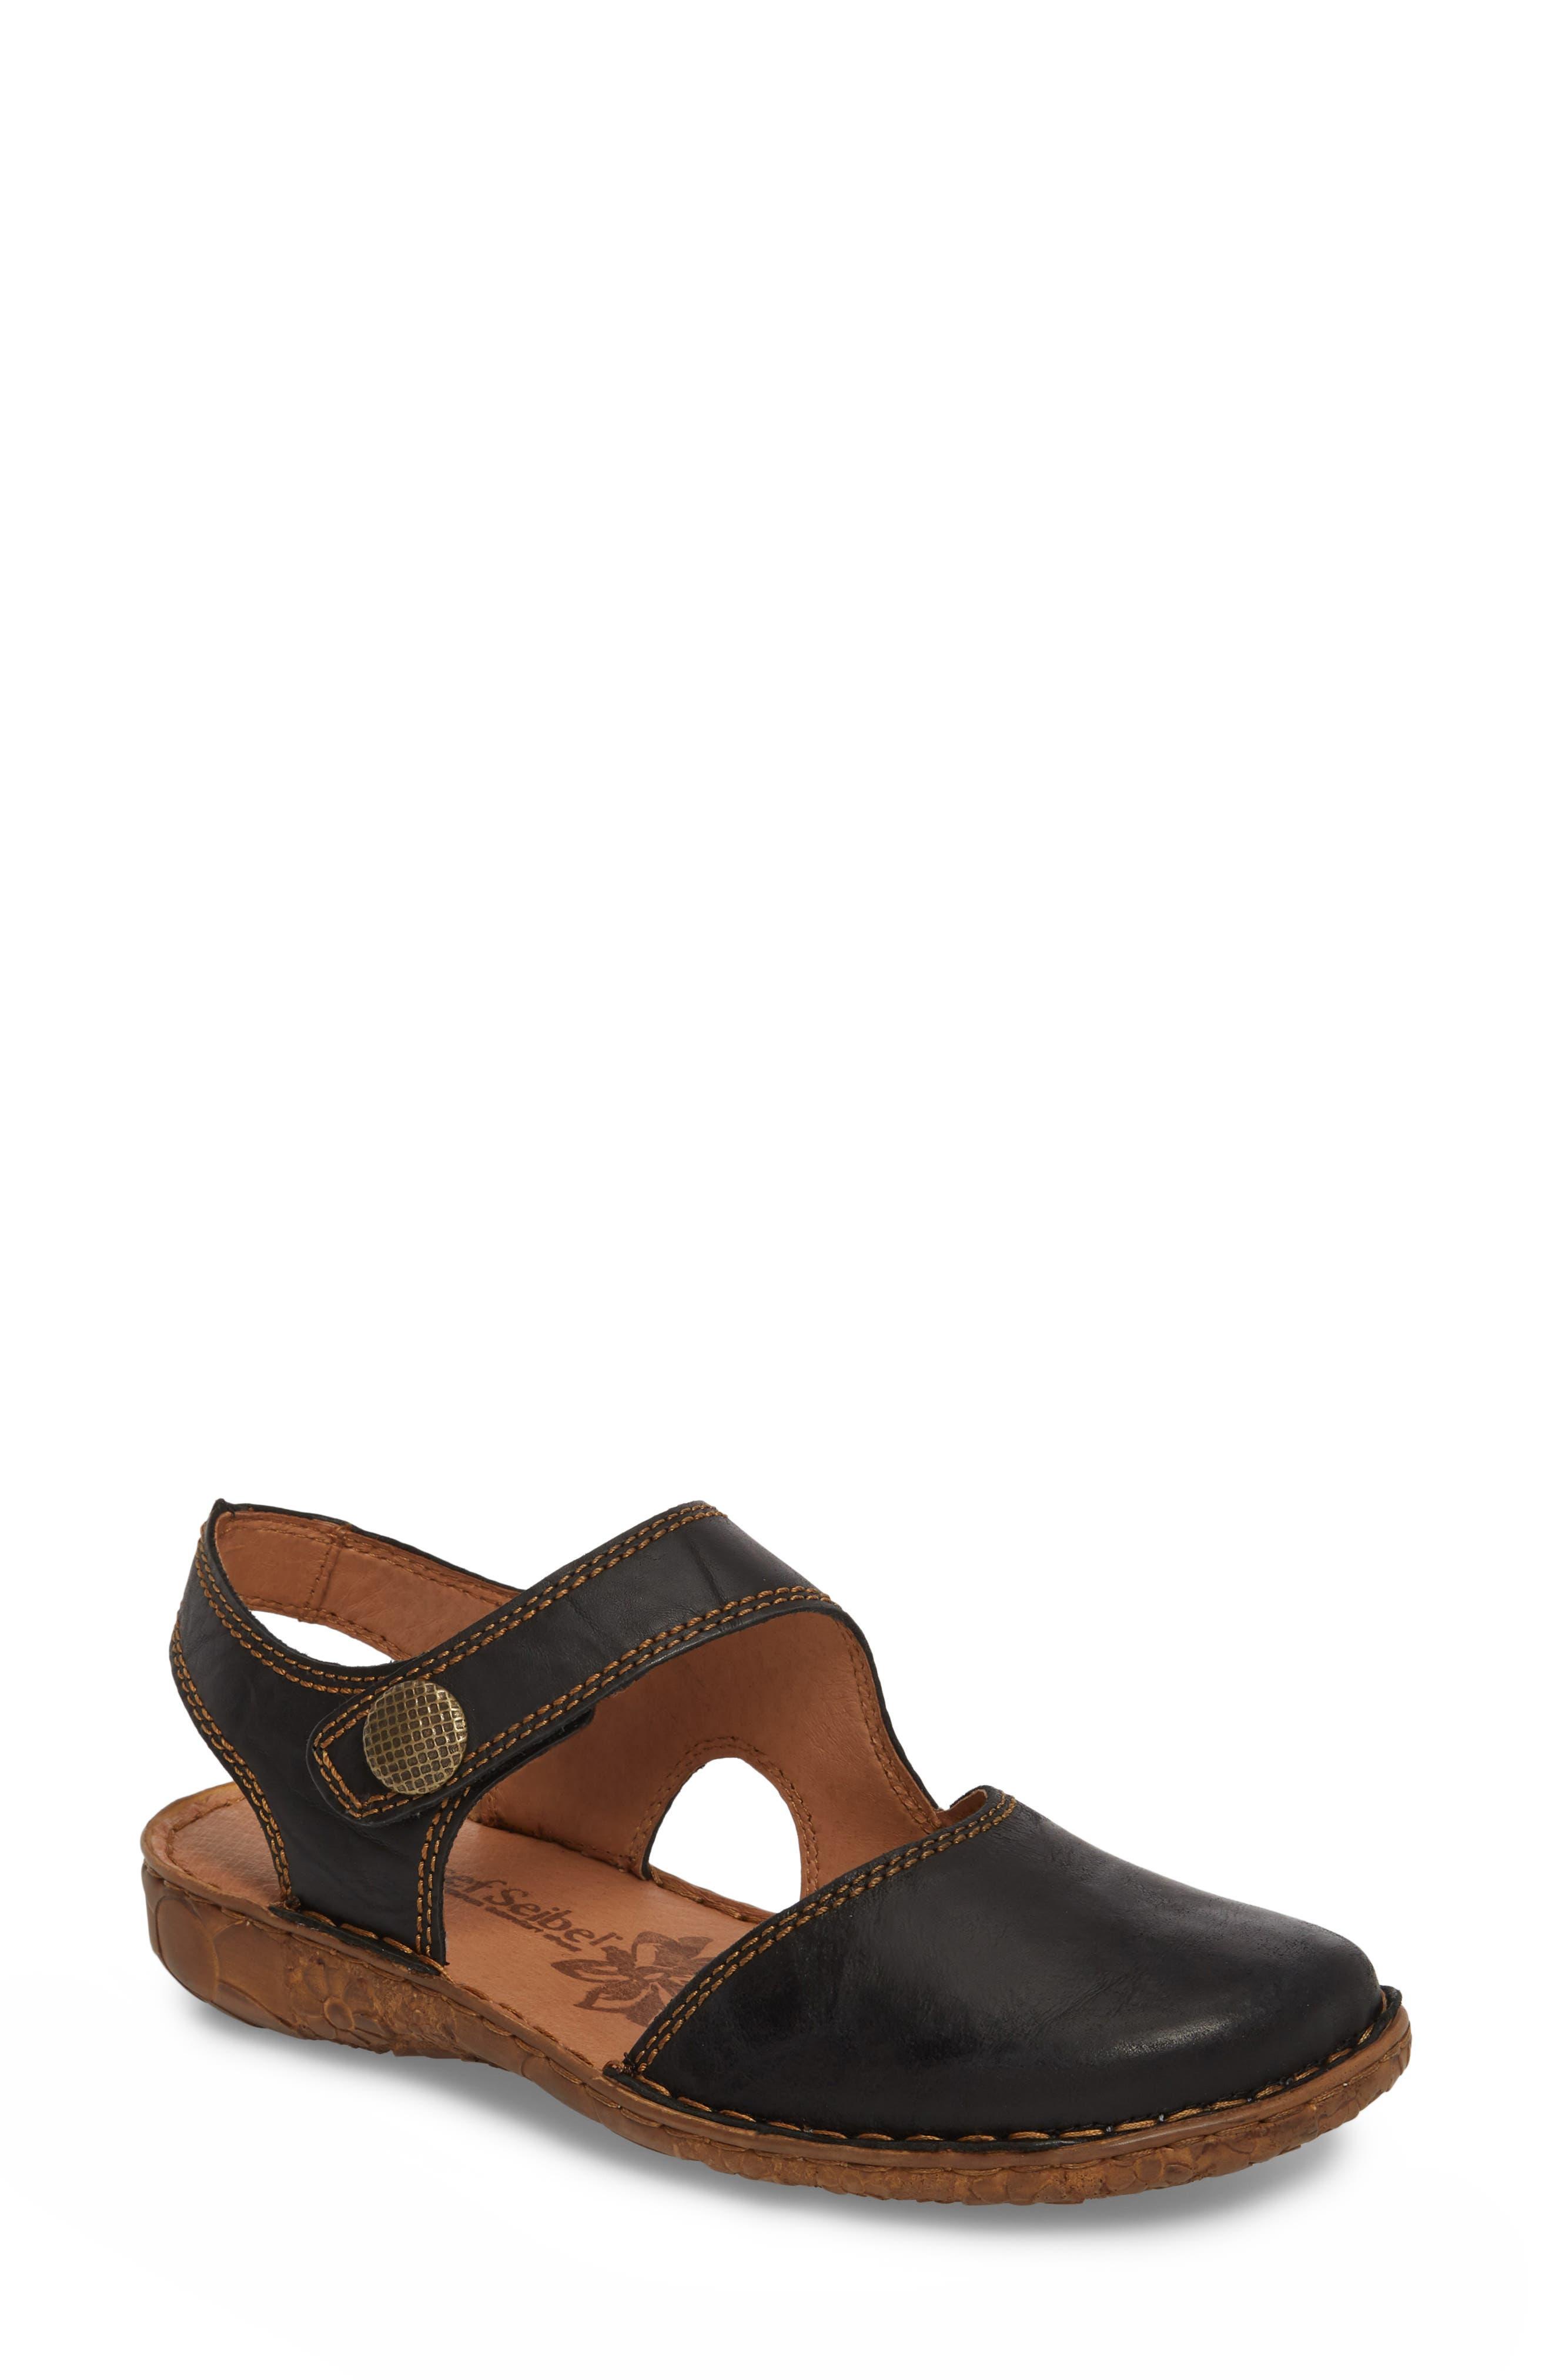 JOSEF SEIBEL Rosalie 27 Sandal, Main, color, BLACK LEATHER